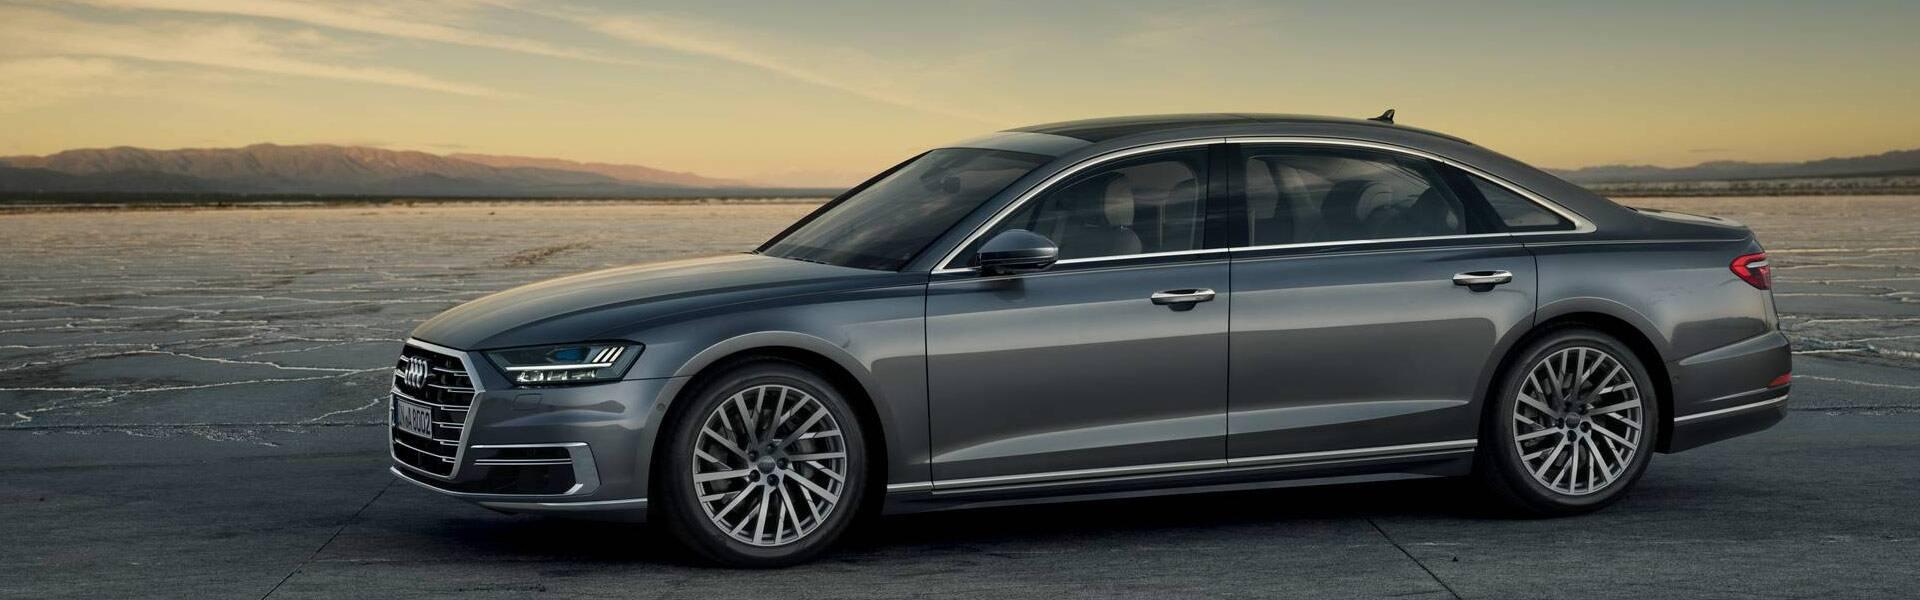 A8 L A8 Audi Deutschland